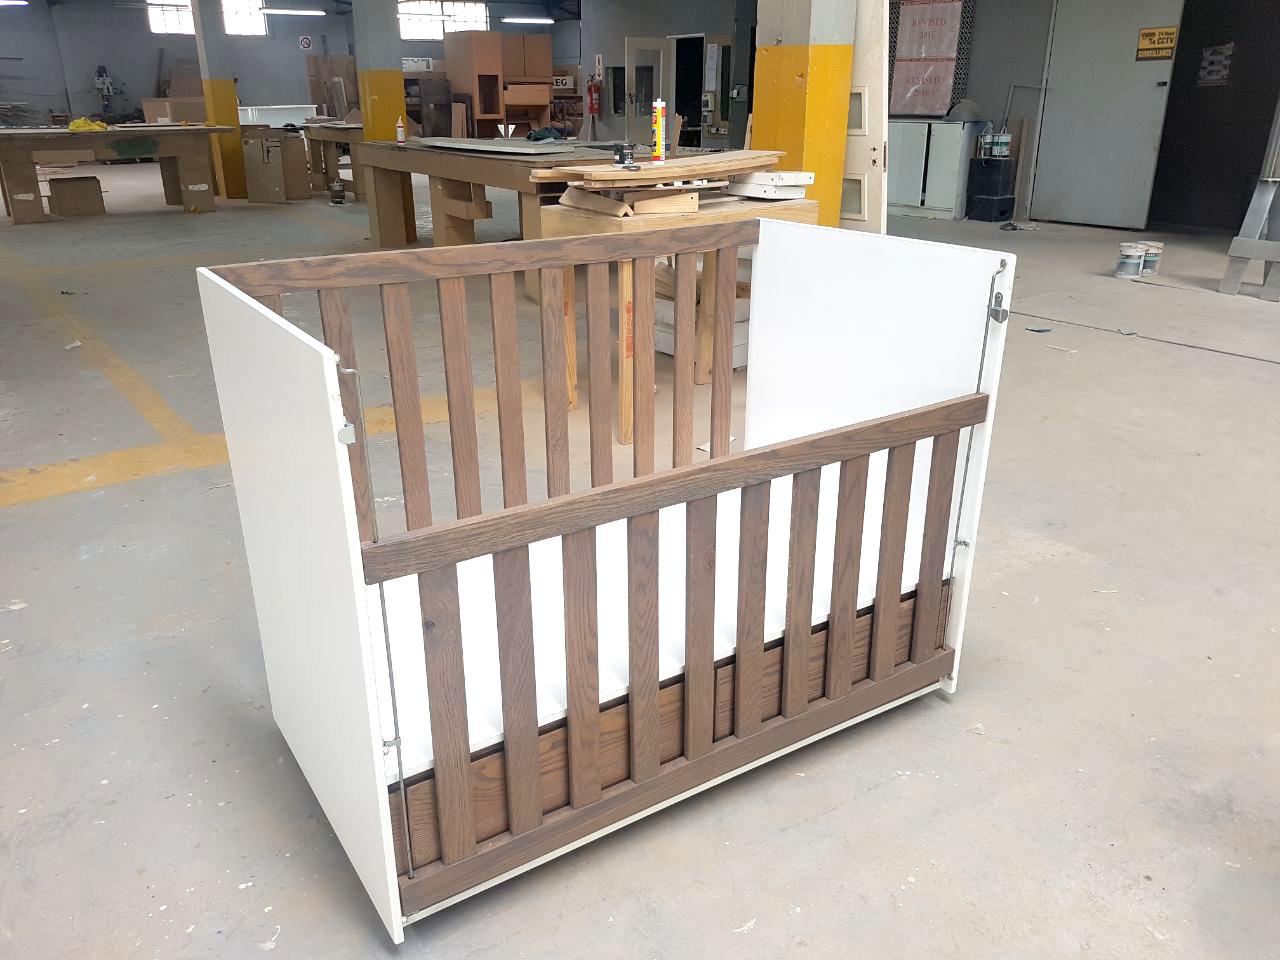 Design Furniture - Wooden Crib